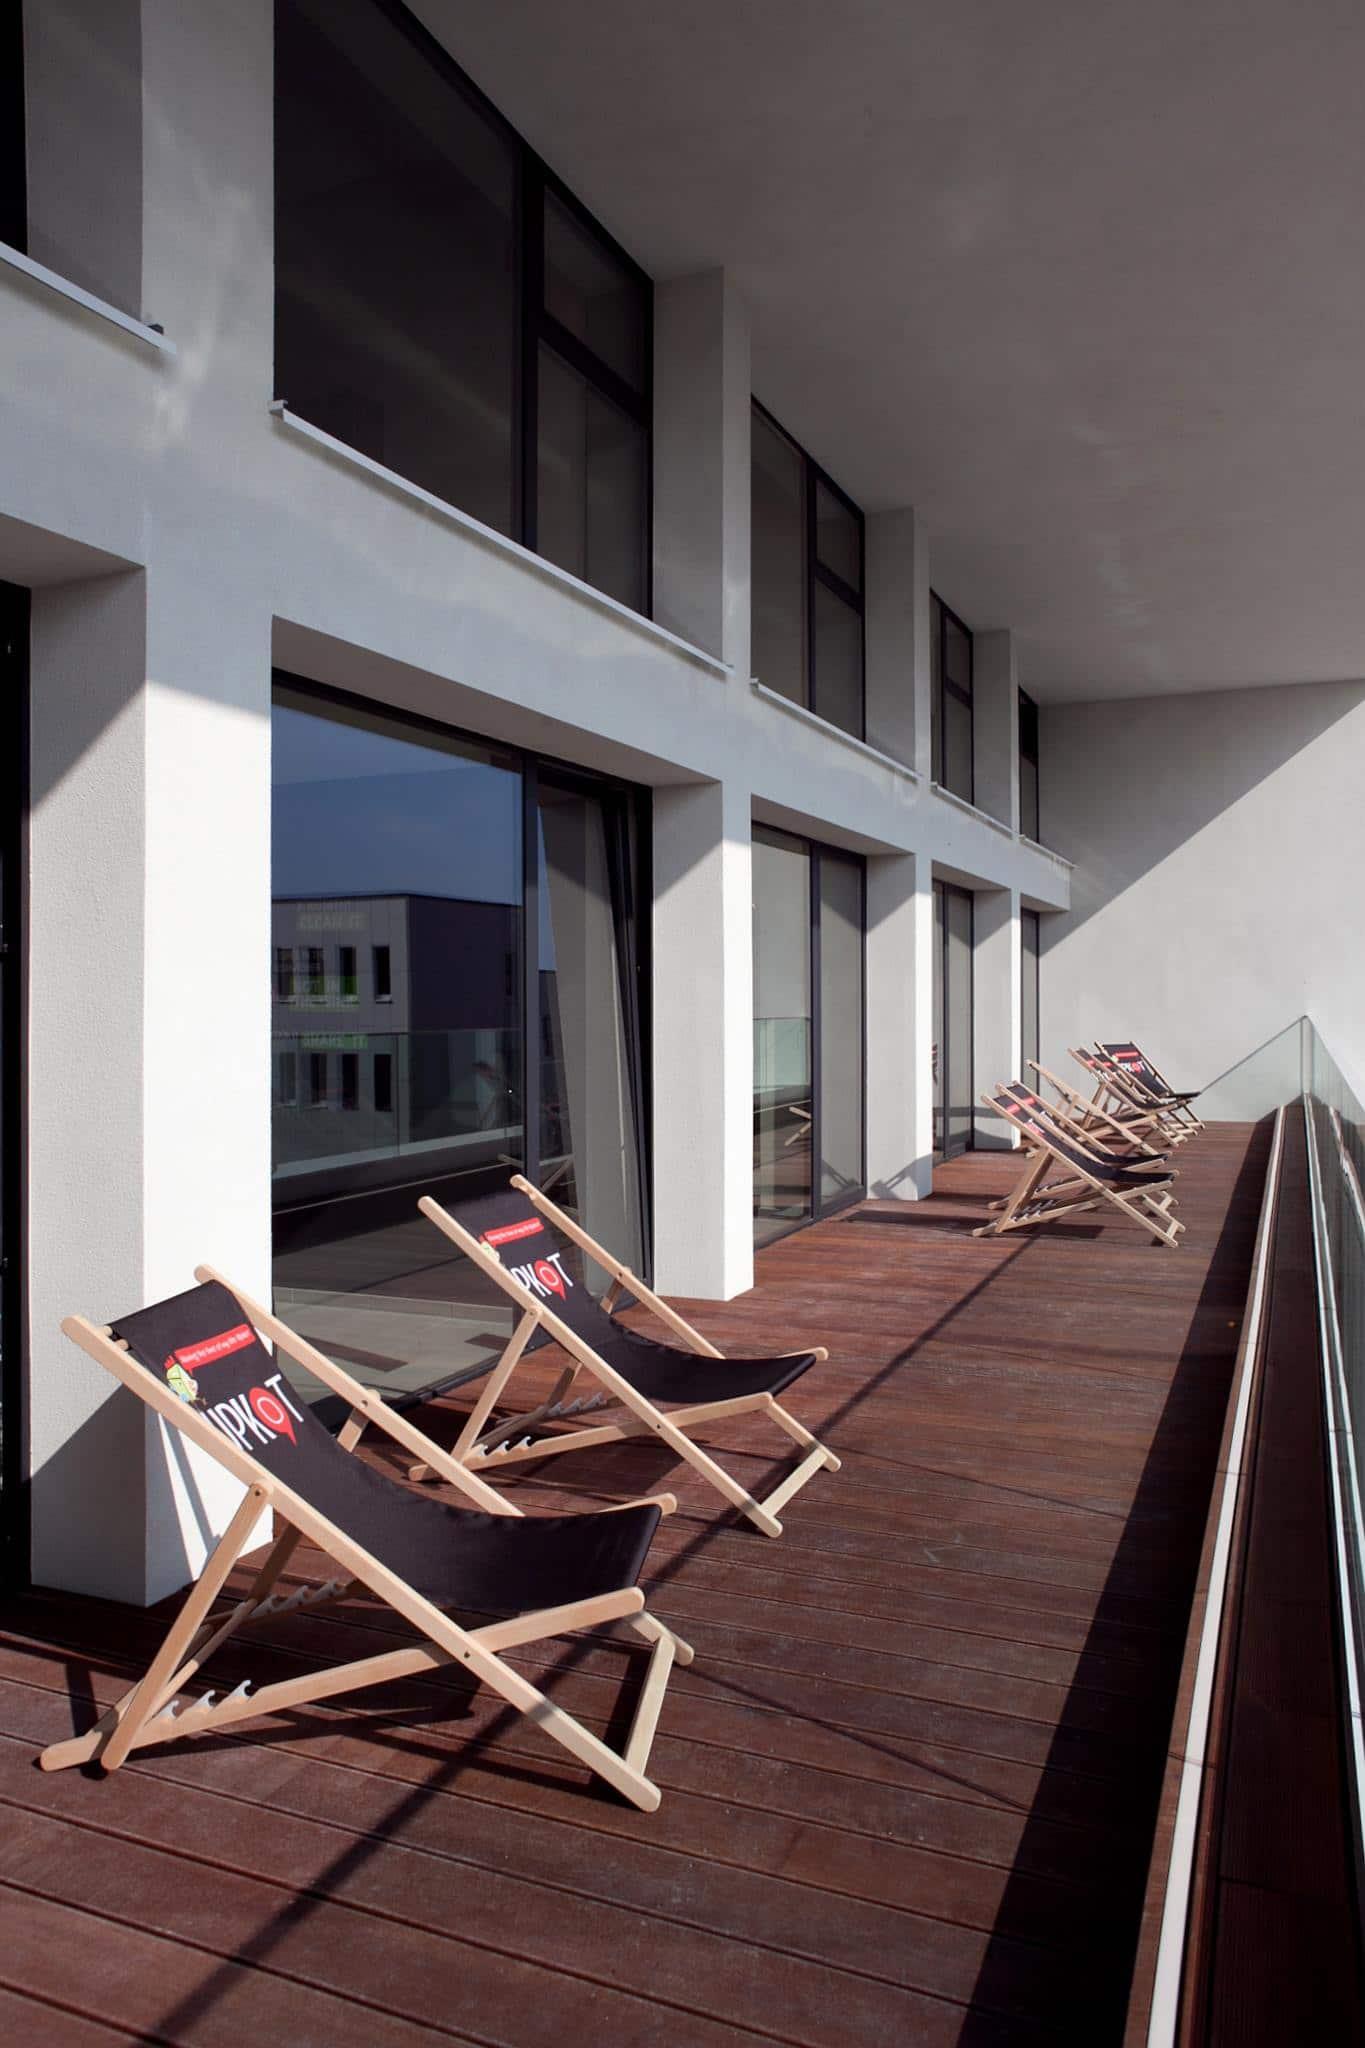 10658807 709638289114048 3752784242677029835 o 709638289114048 | Baeyens & Beck architecten Gent | architect nieuwbouw renovatie interieur | high end | architectenbureau